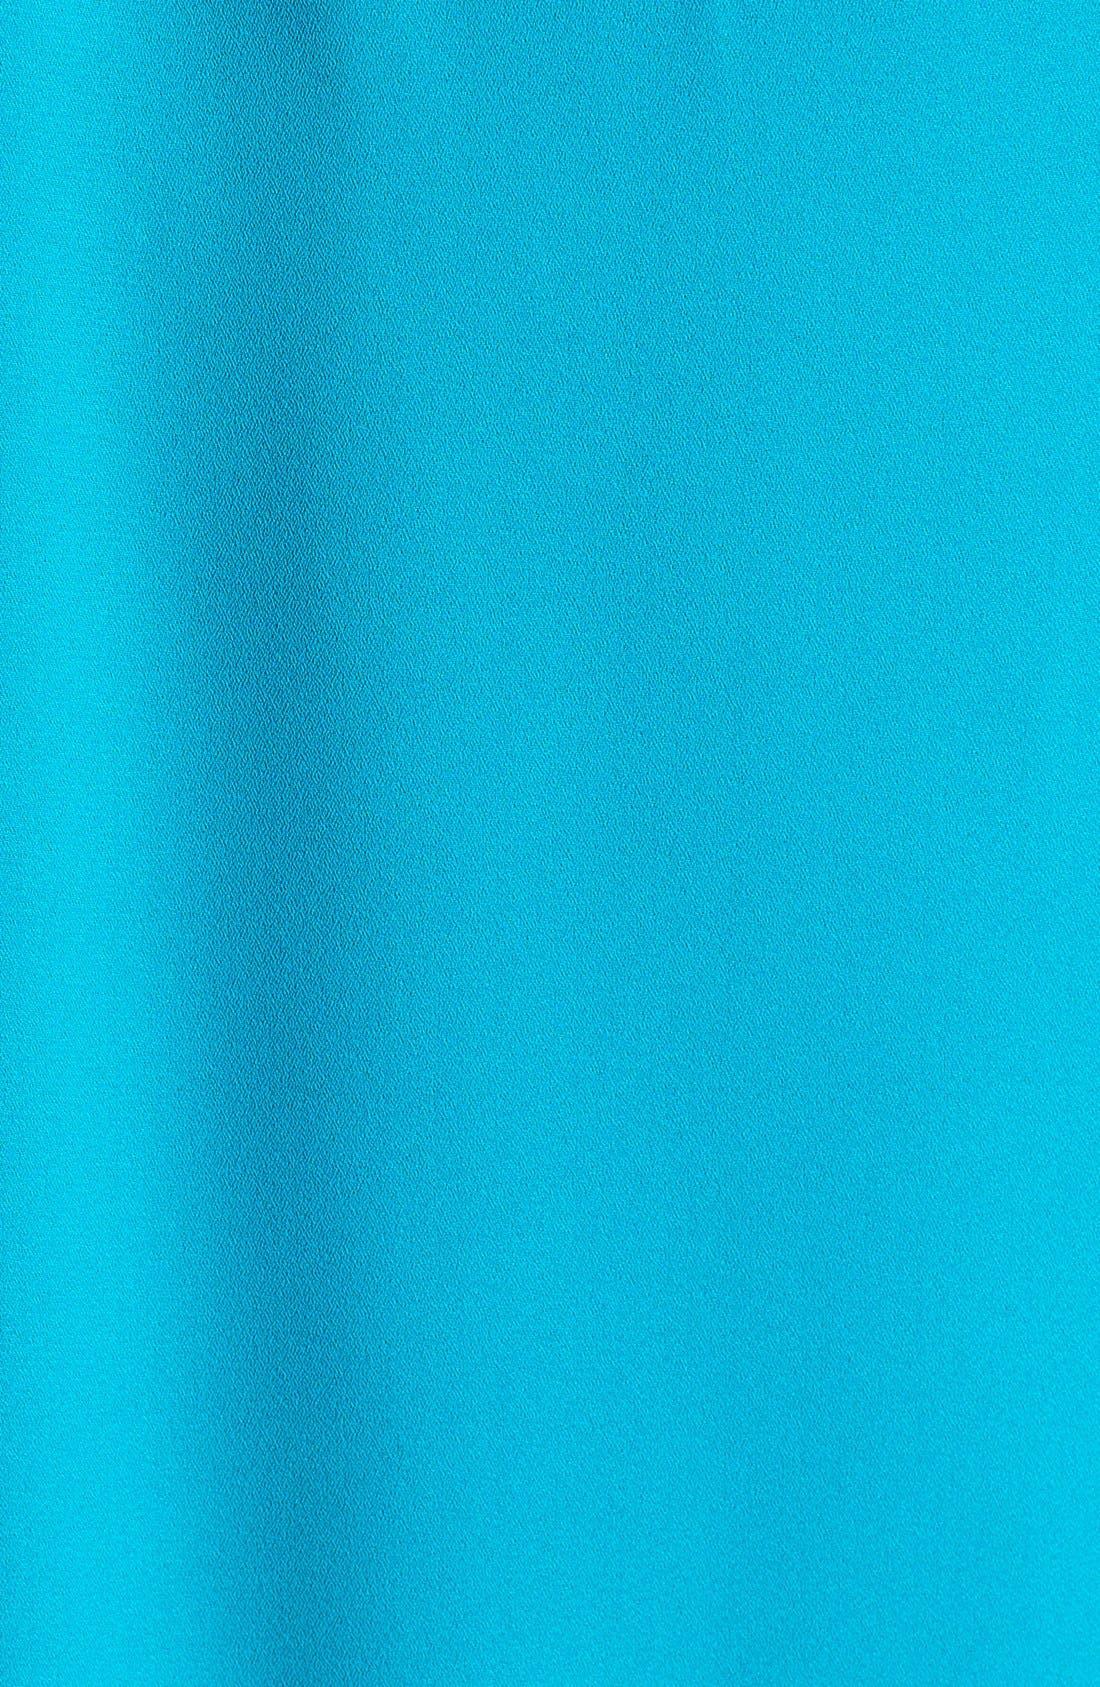 Alternate Image 3  - Vince Camuto Peasant Top (Plus Size)